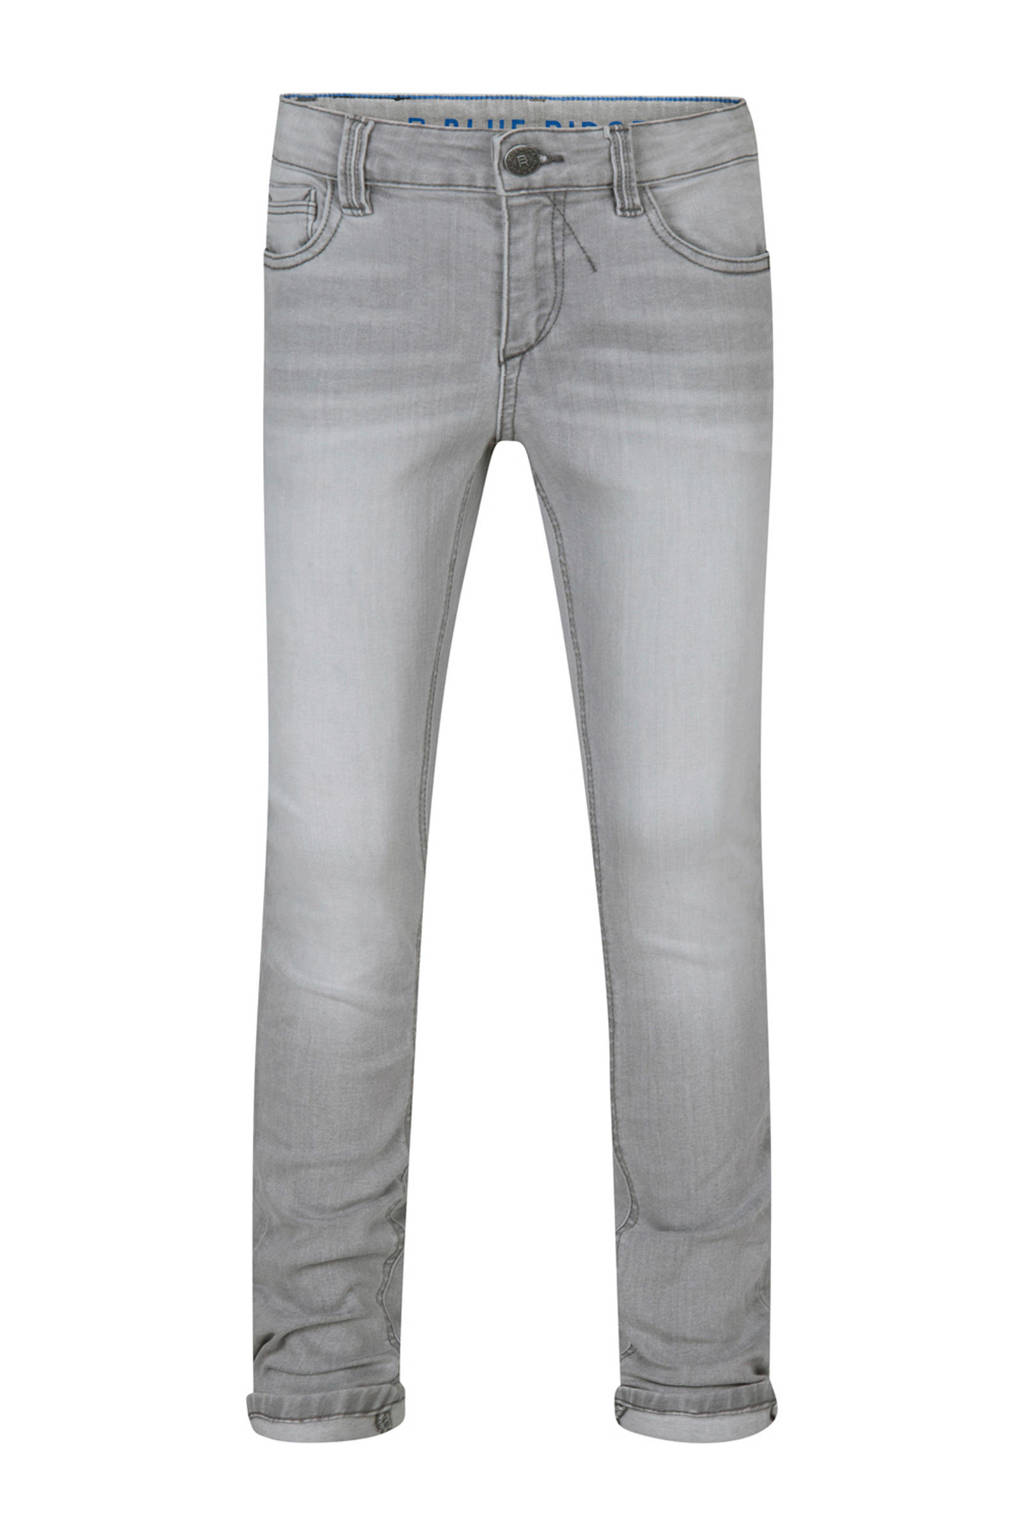 WE Fashion Blue Ridge super skinny jeans Hidde grijs, Grijs